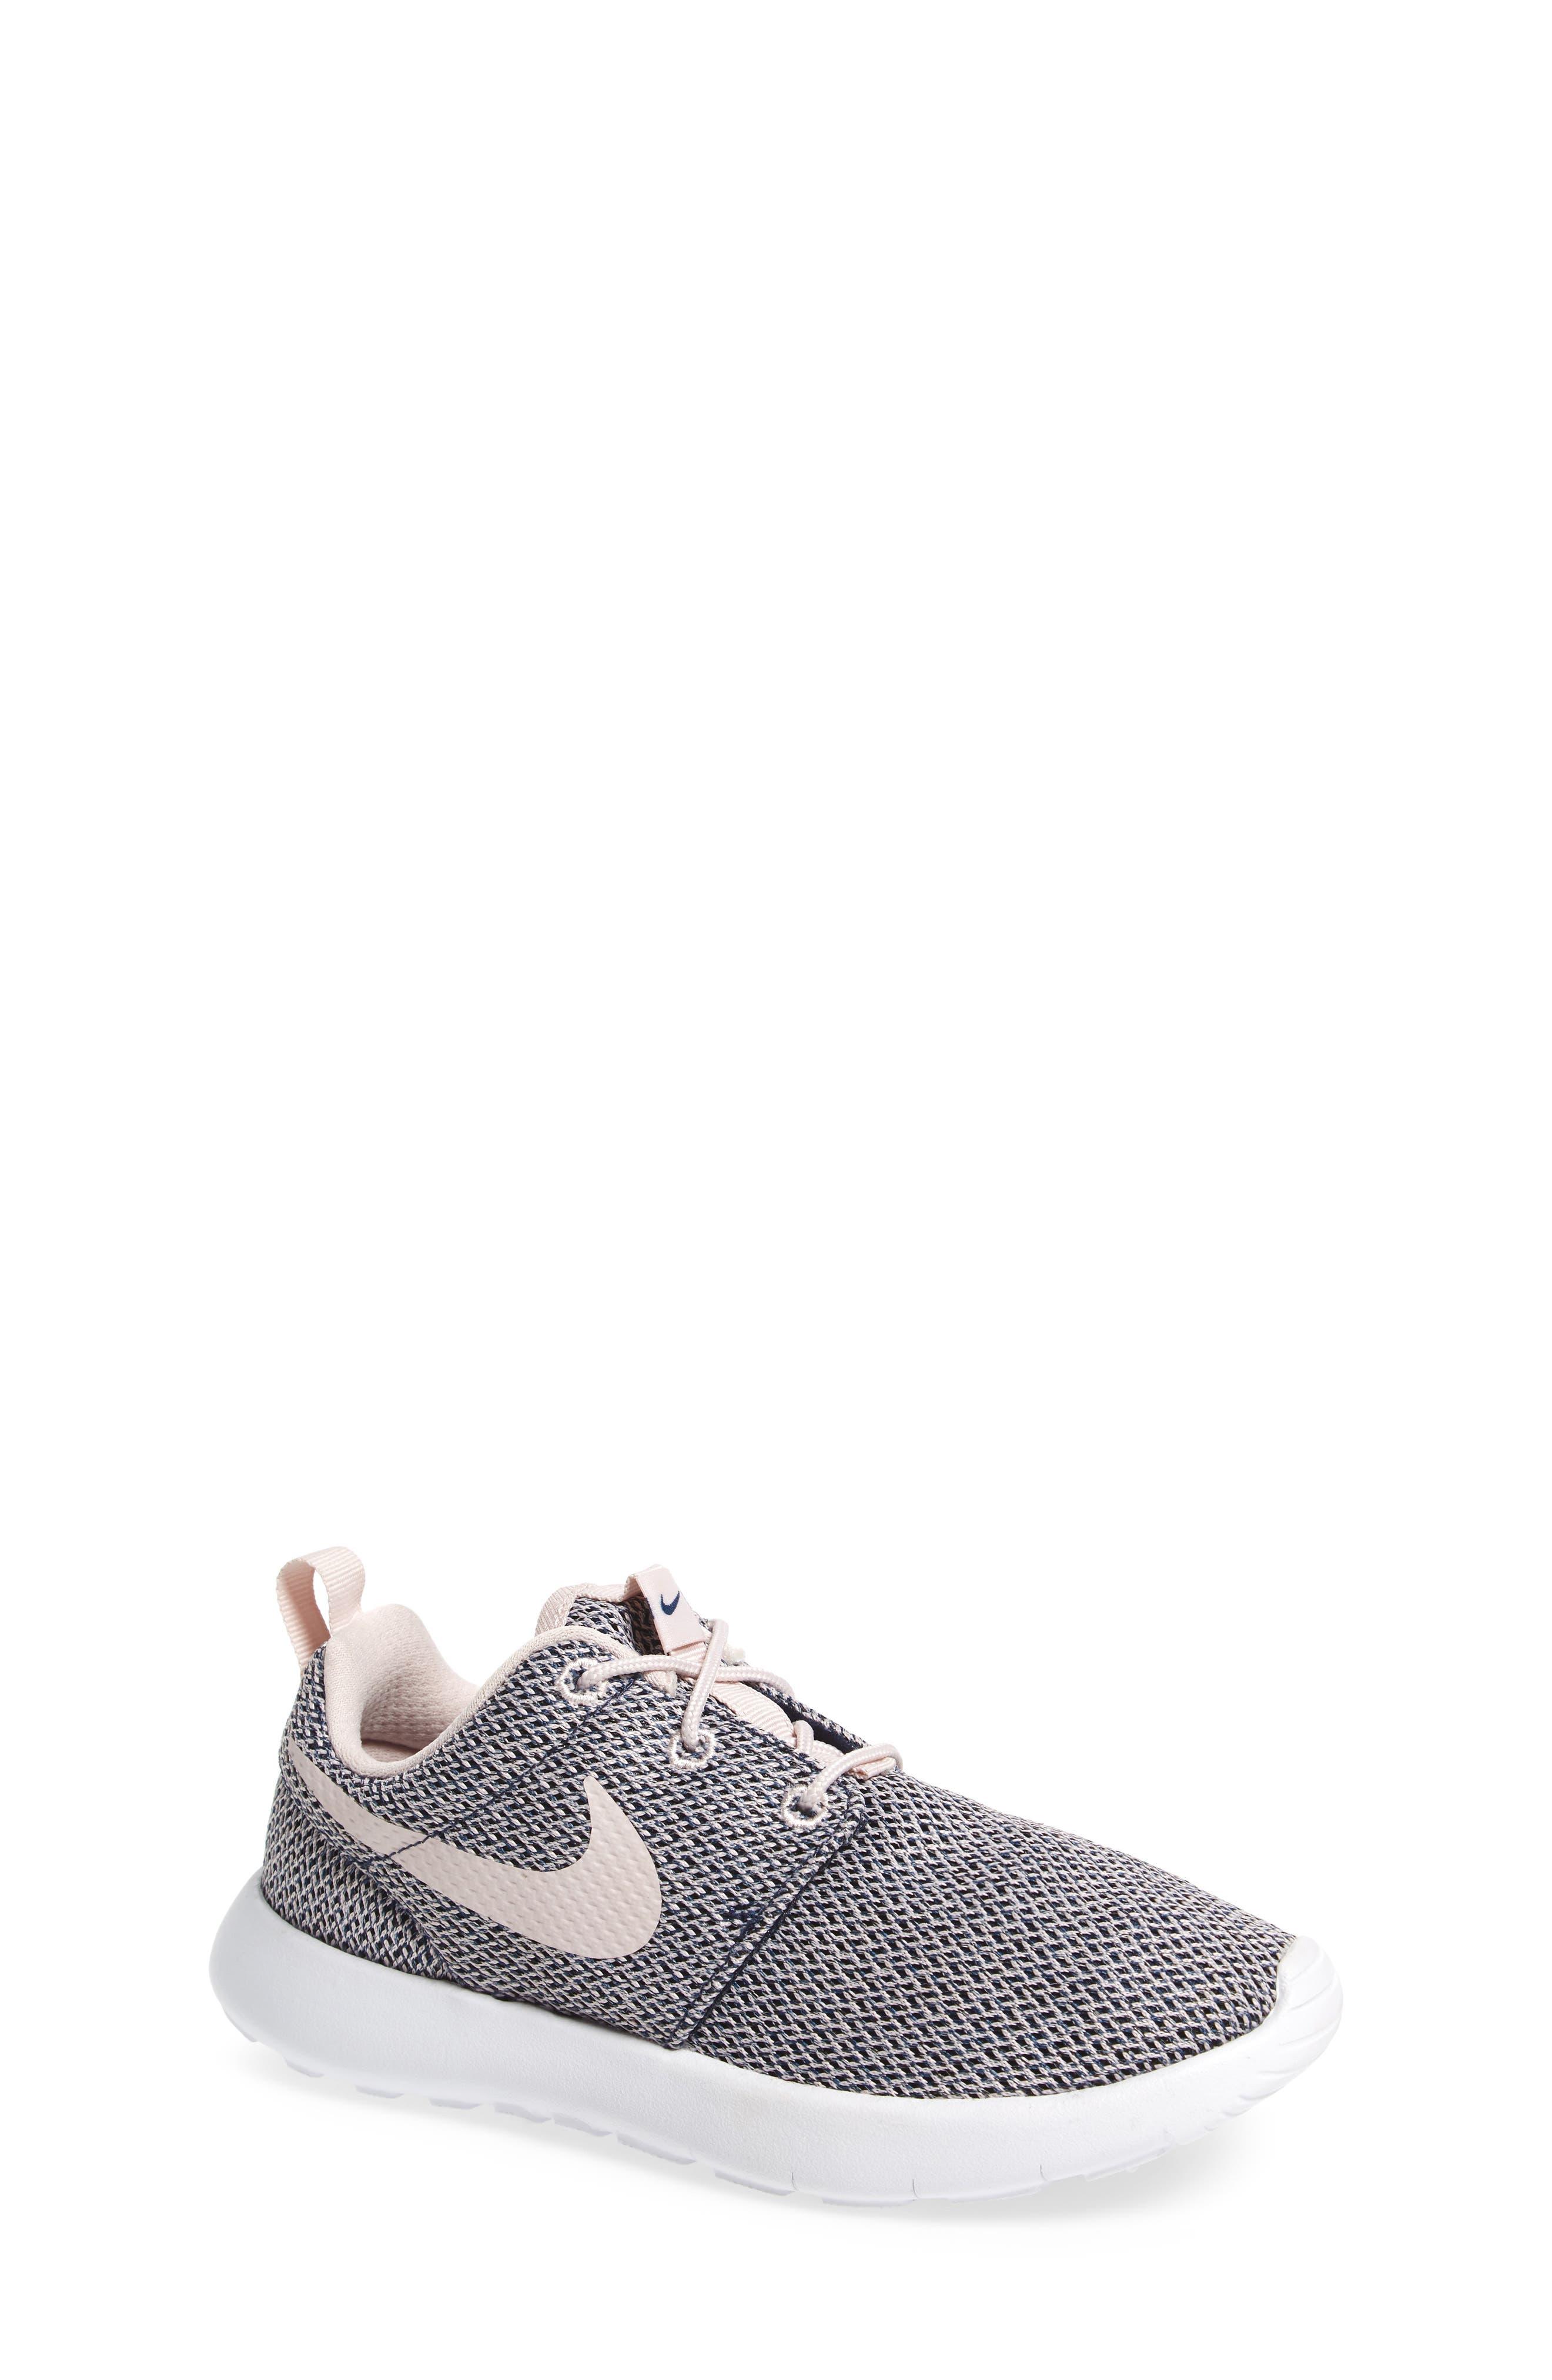 'Roshe Run' Athletic Shoe,                             Main thumbnail 6, color,